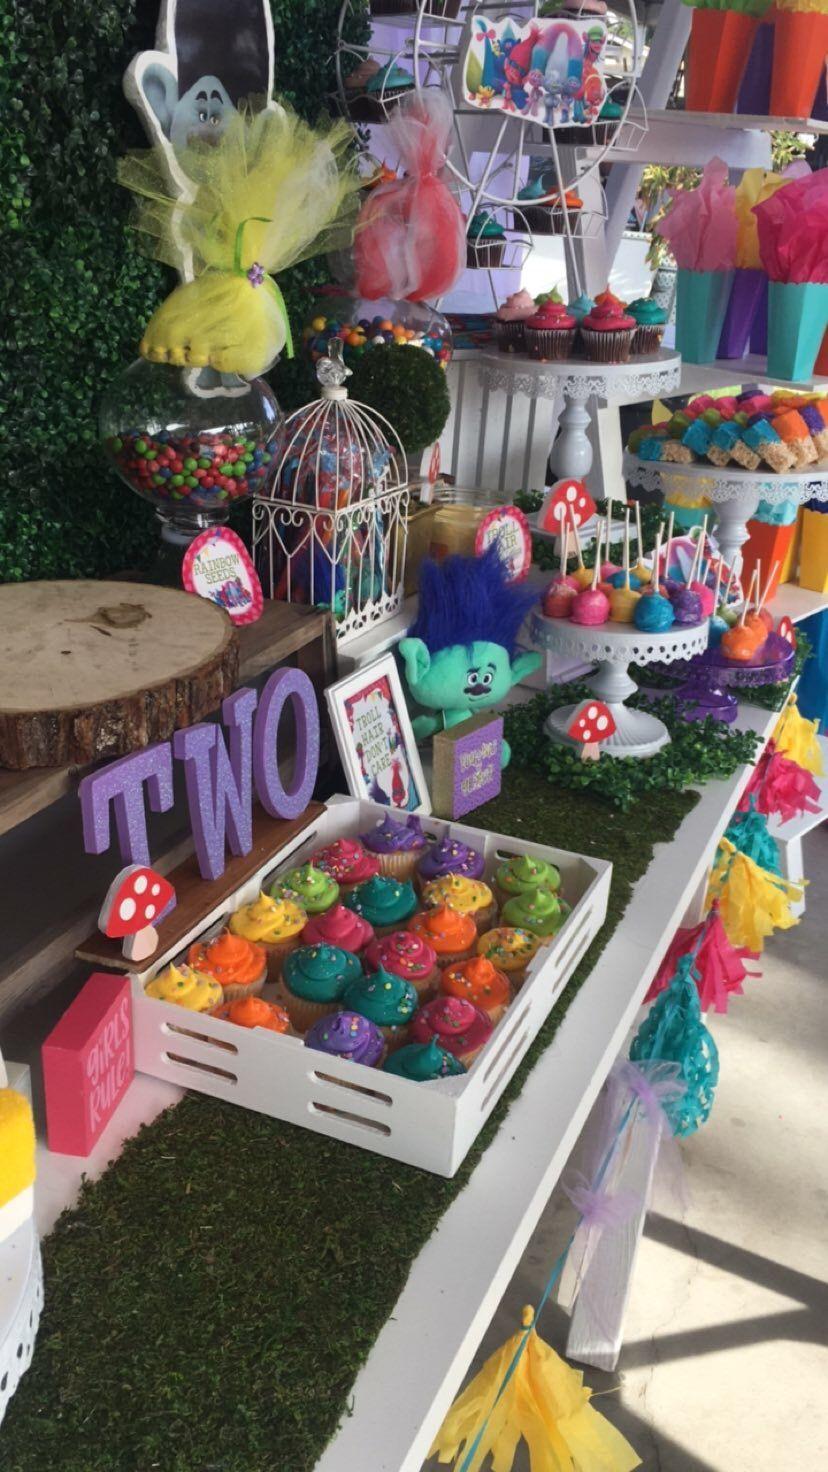 Trolls Party Trolls Candy Table Birthday Party Candy Table Trolls Birthday Trolls Birthday Cake